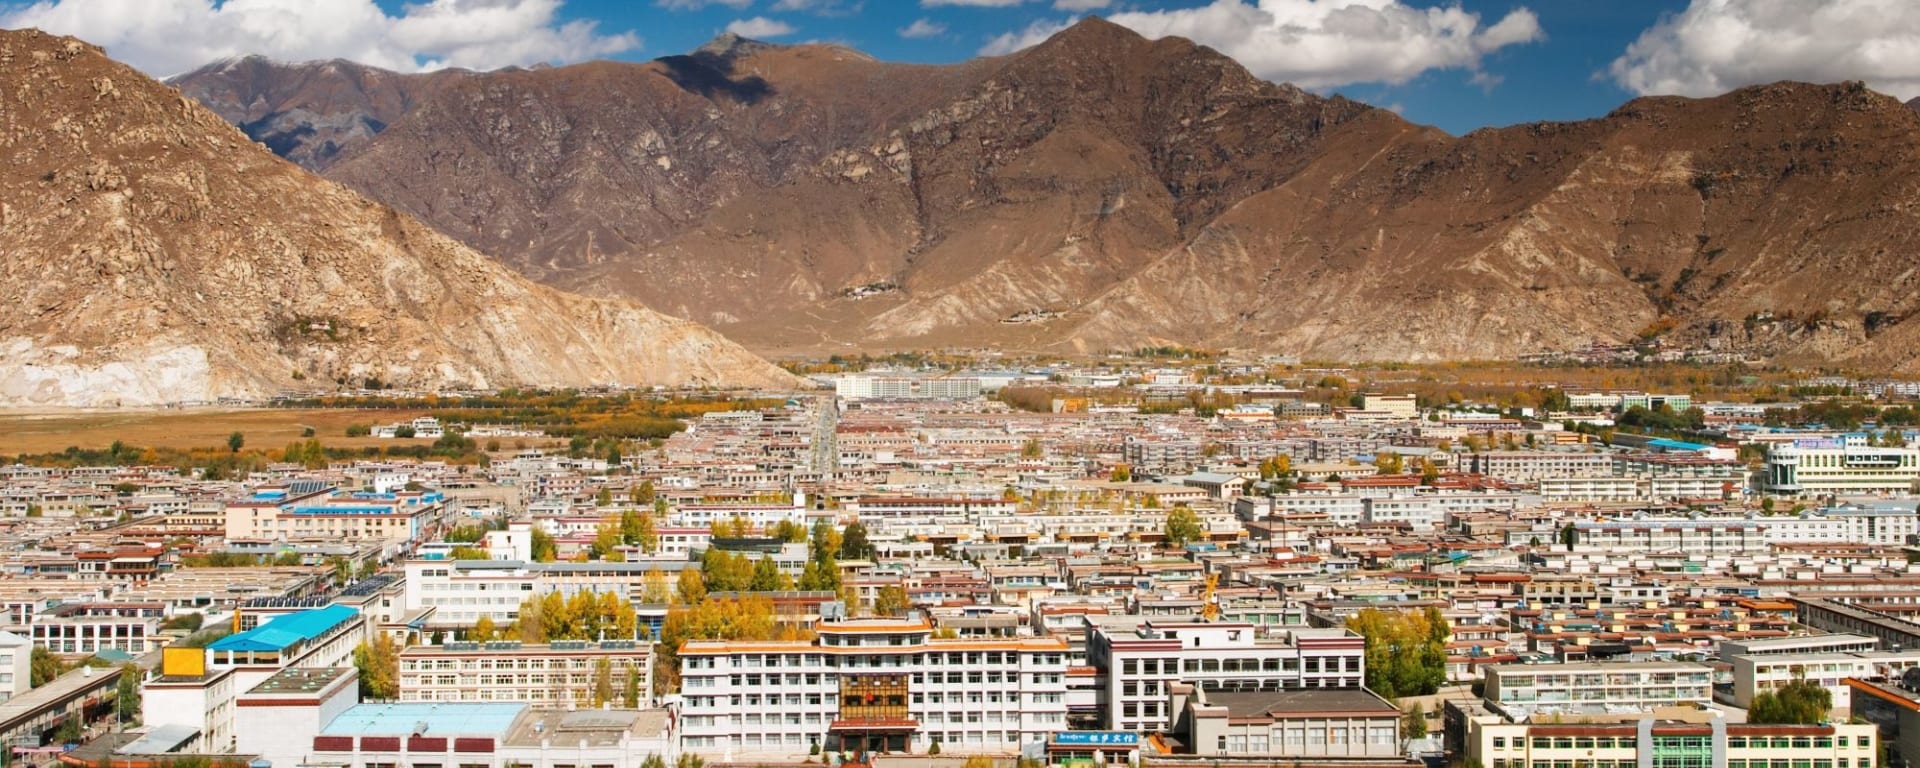 Die Magie des Tibets - Basis & Tsetang Verlängerung ab Lhasa: Lhasa beautiful view